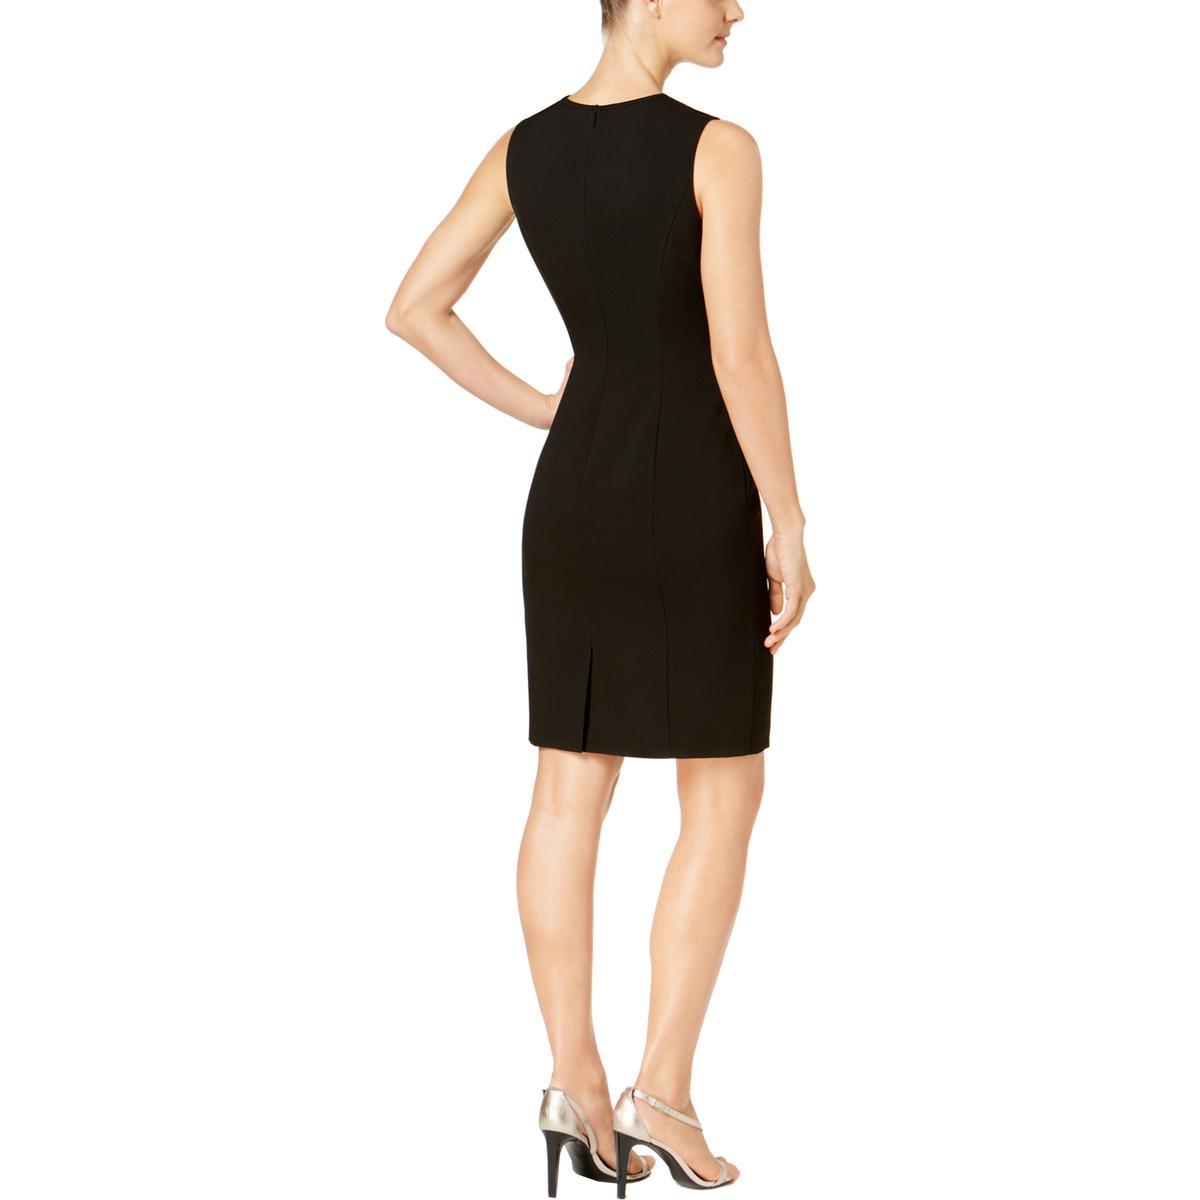 74b9bf1920e81 Calvin Klein Womens Black Mesh Inset Sheath Midi Dress Petites 2P ...